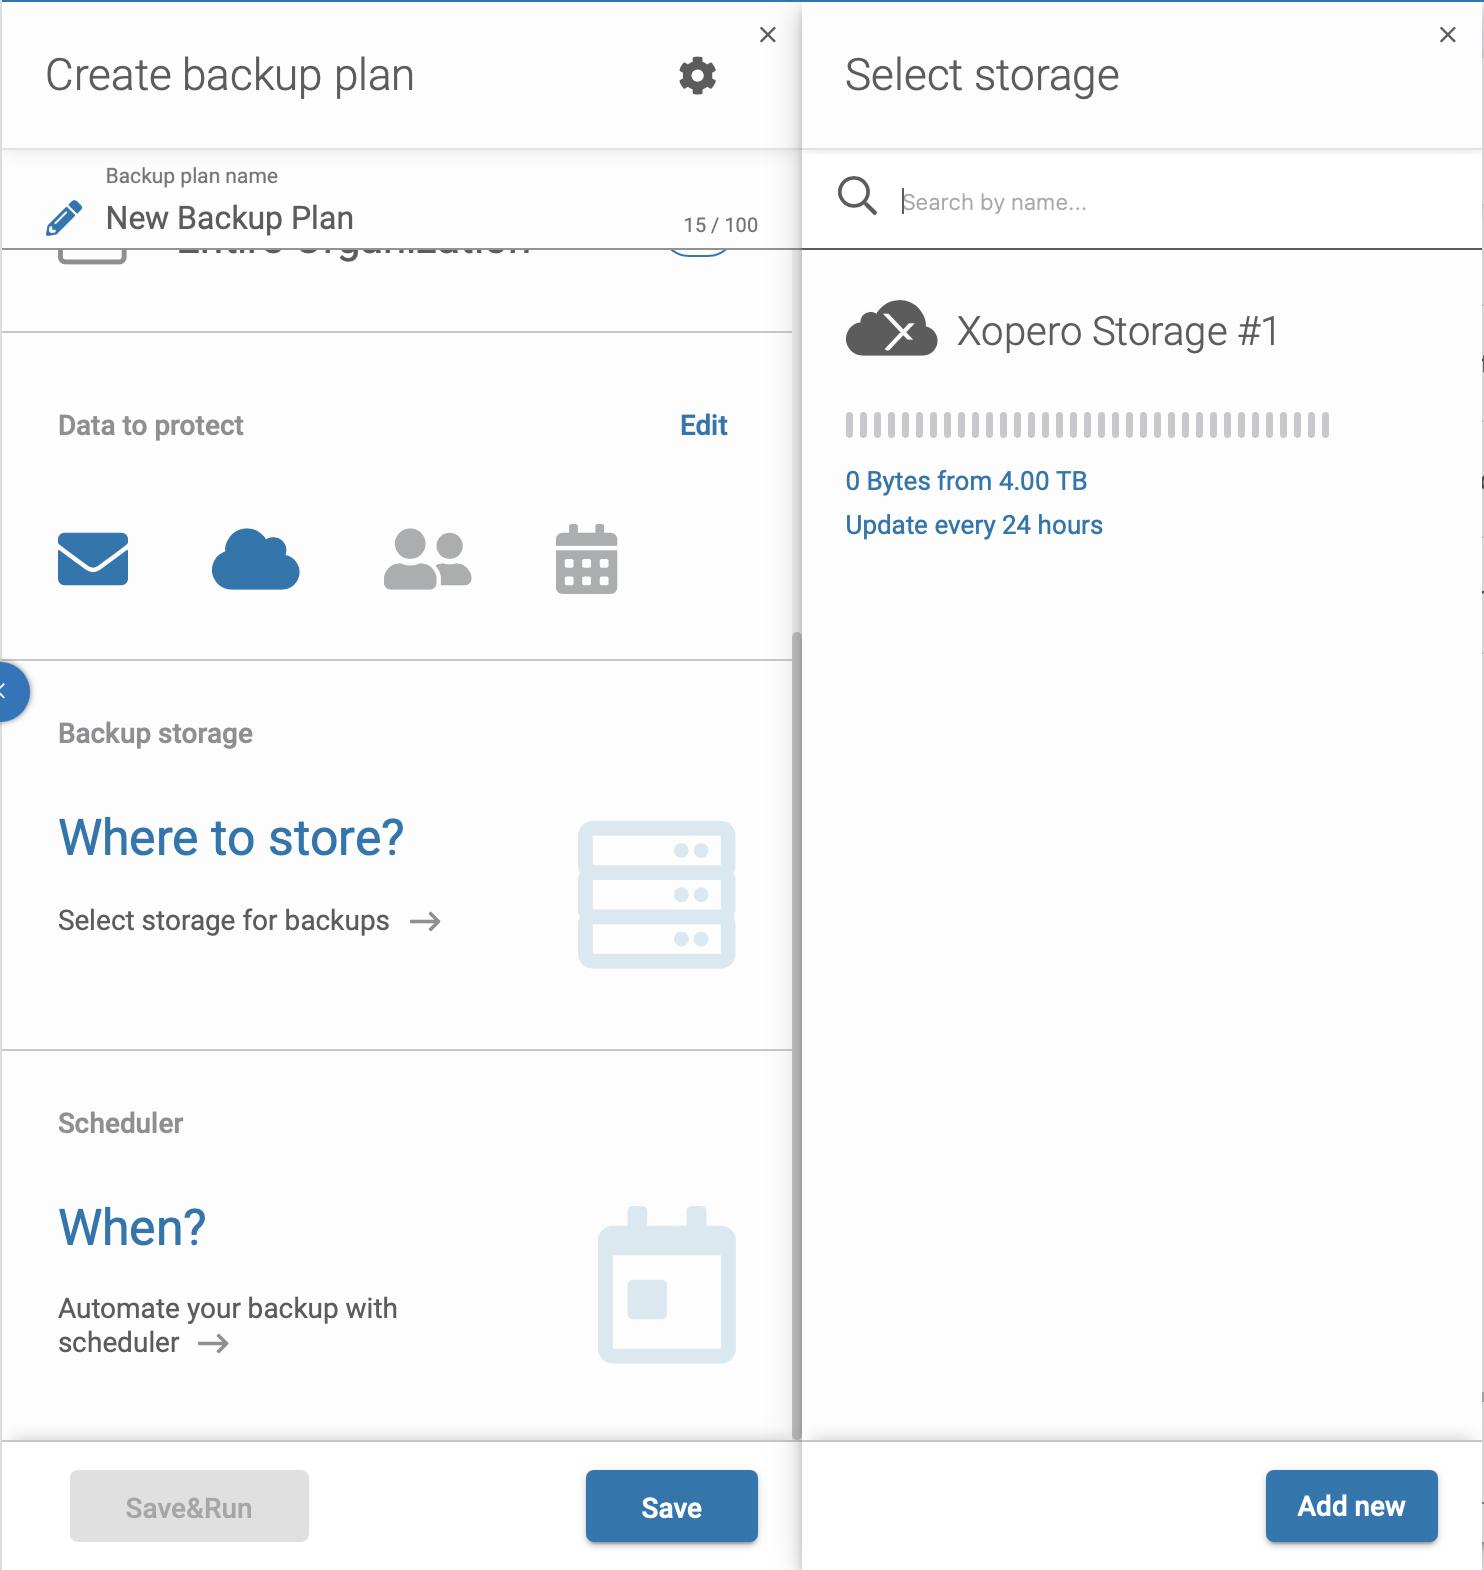 Microsoft 365 backup plan - select backup storage